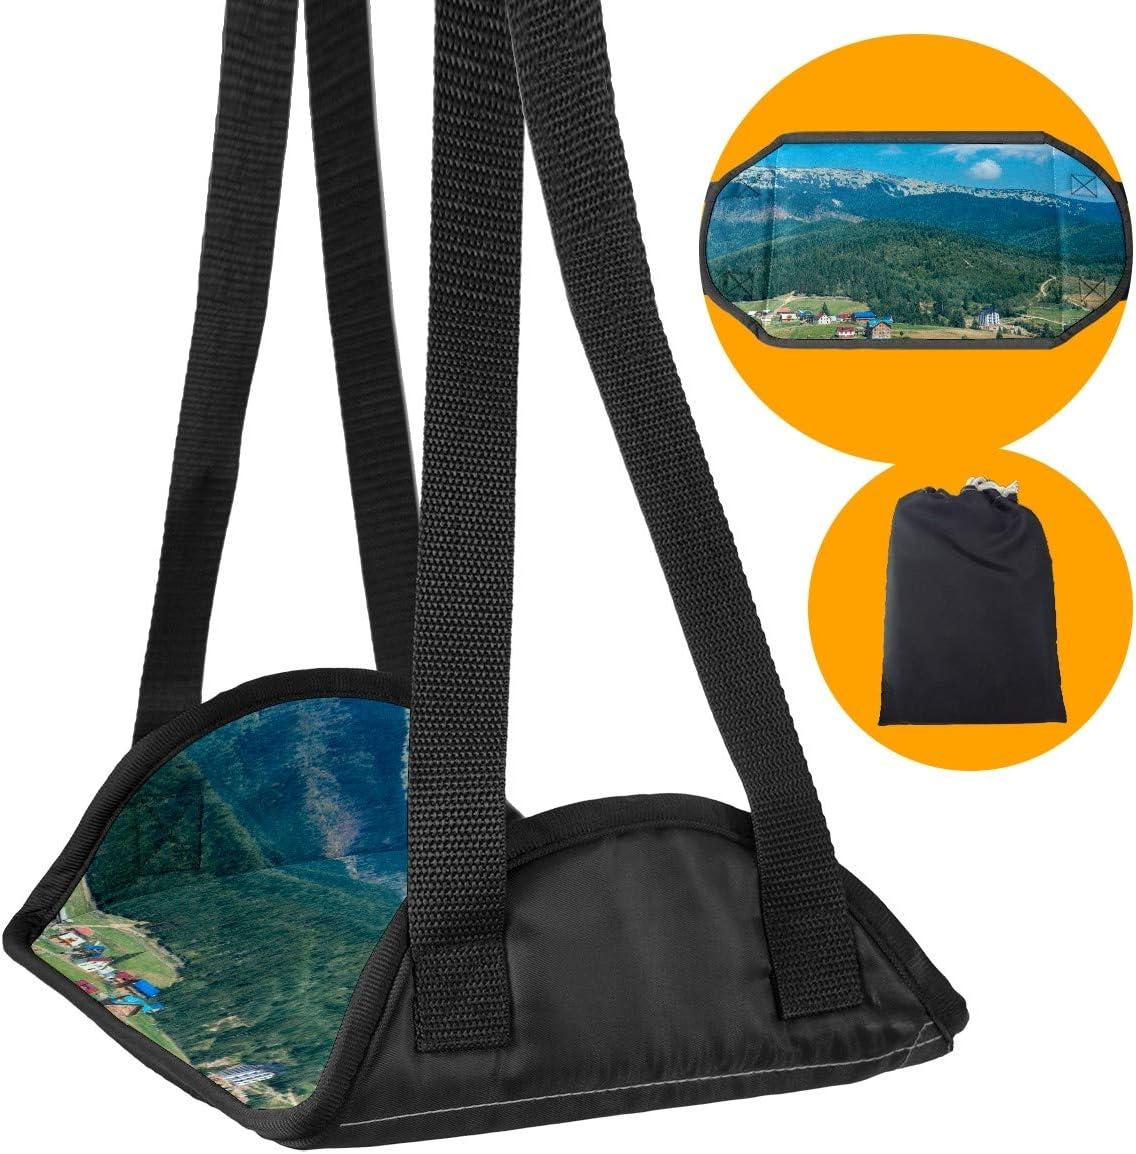 Foot Hammock Desk Footrest Comfy Portable 1 year warranty Hanger,Mountain Max 61% OFF